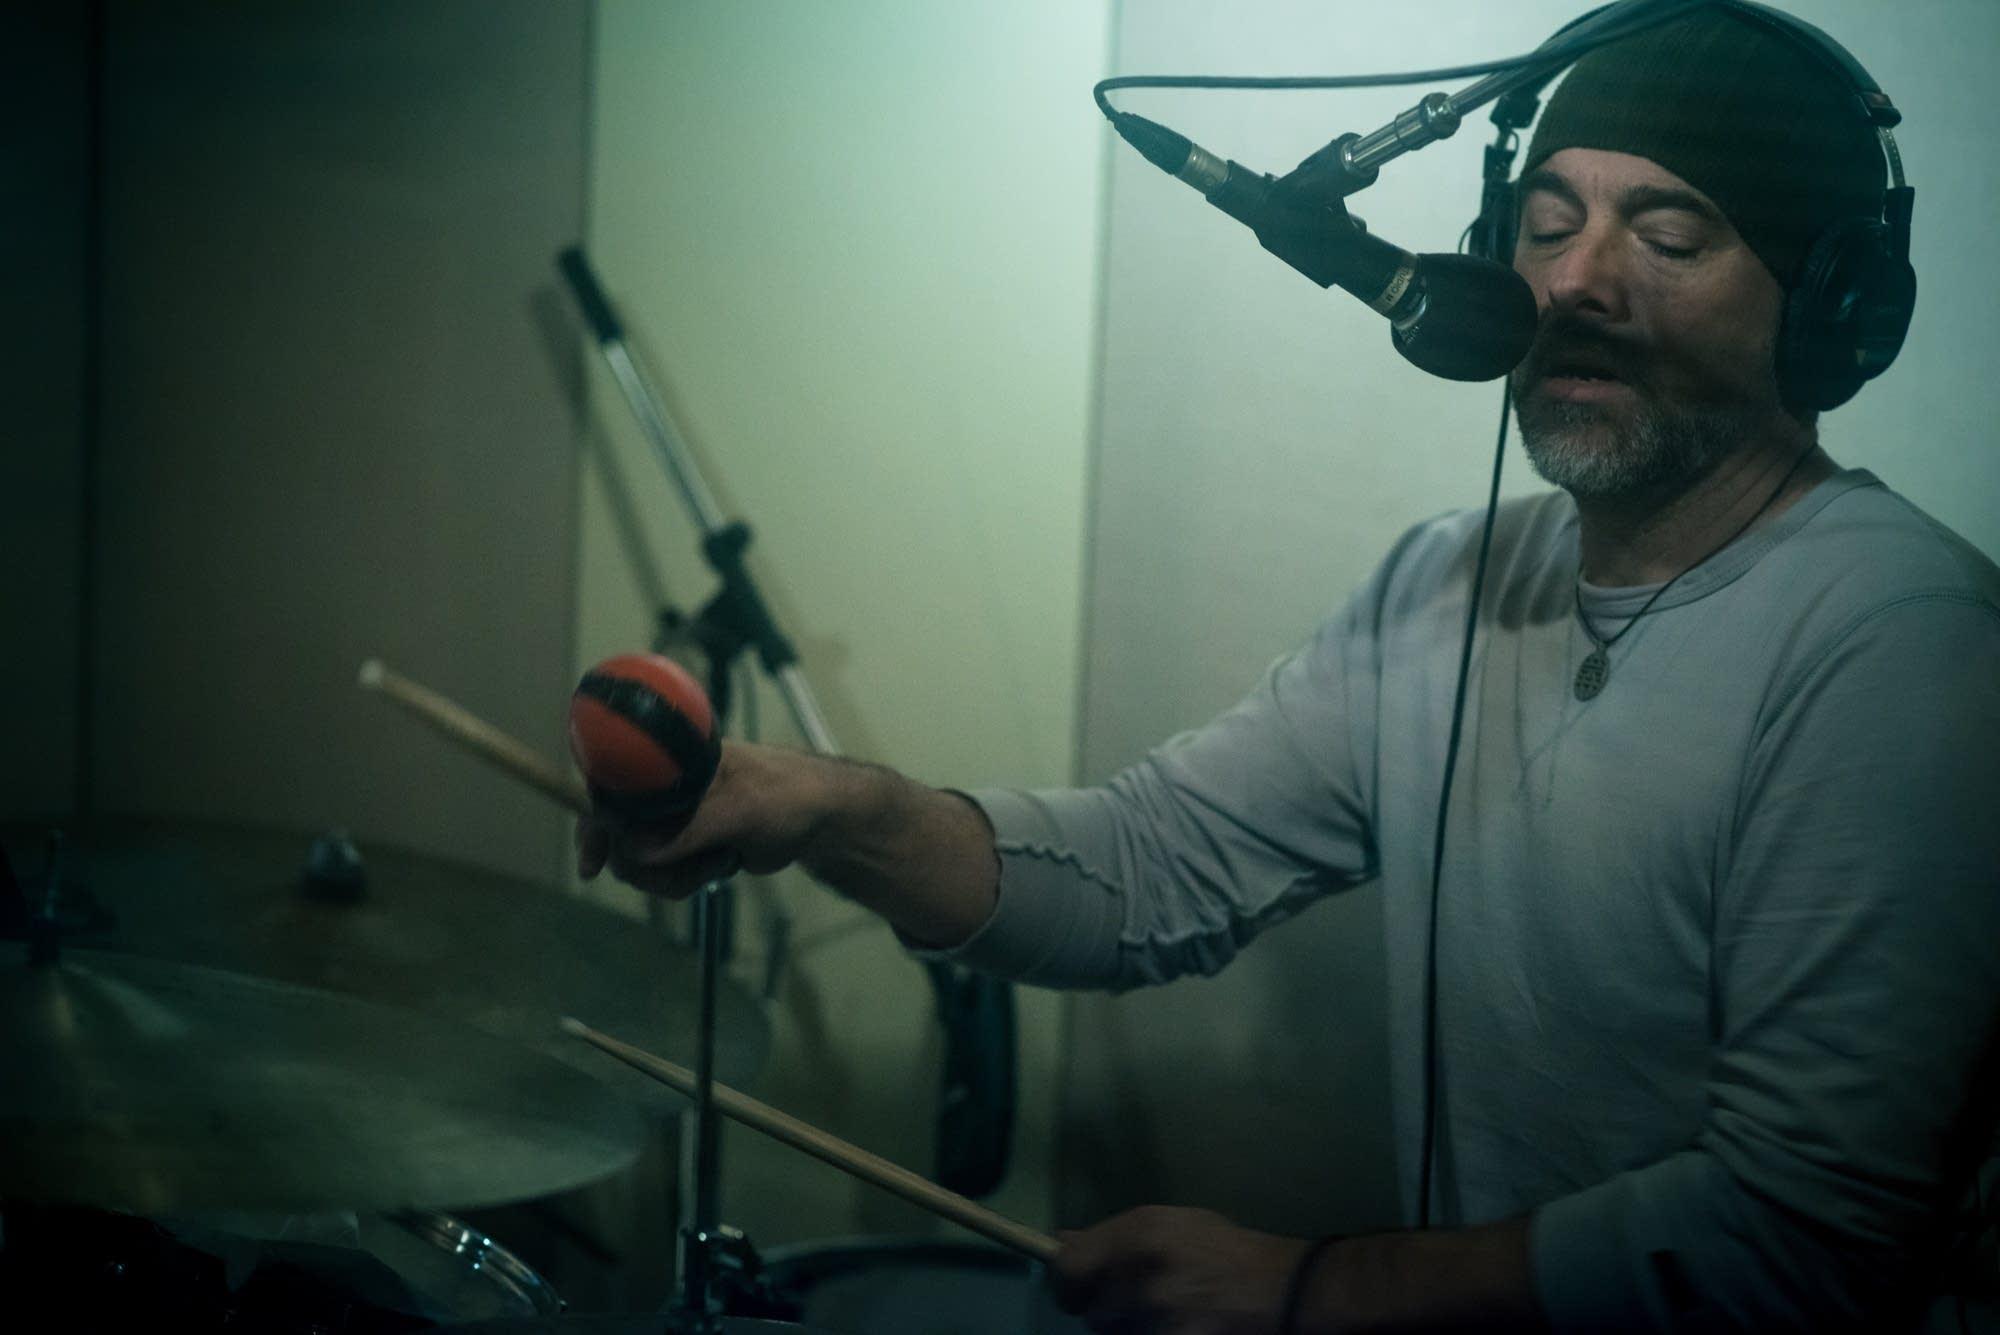 Drummer Tim Powles